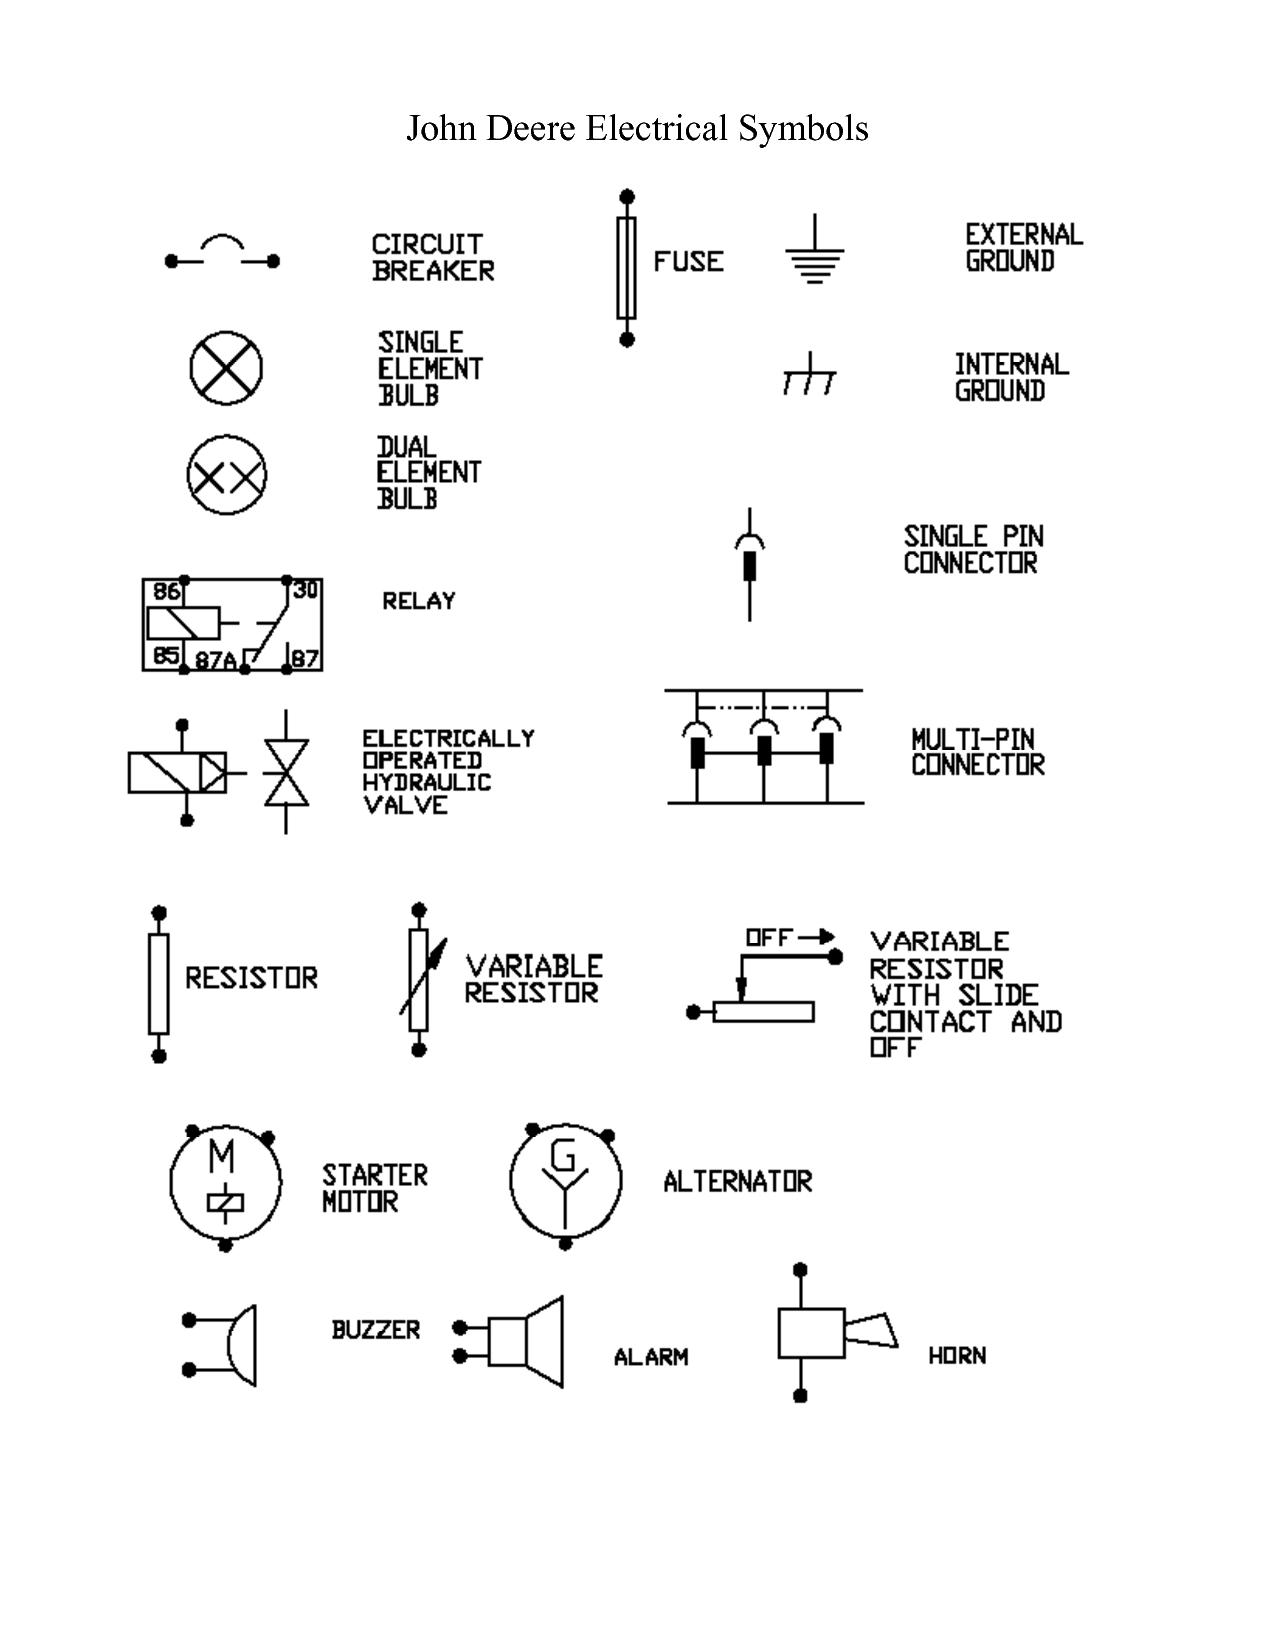 electric motor wiring diagram symbols water heater thermostat pnuematics john deere electrical